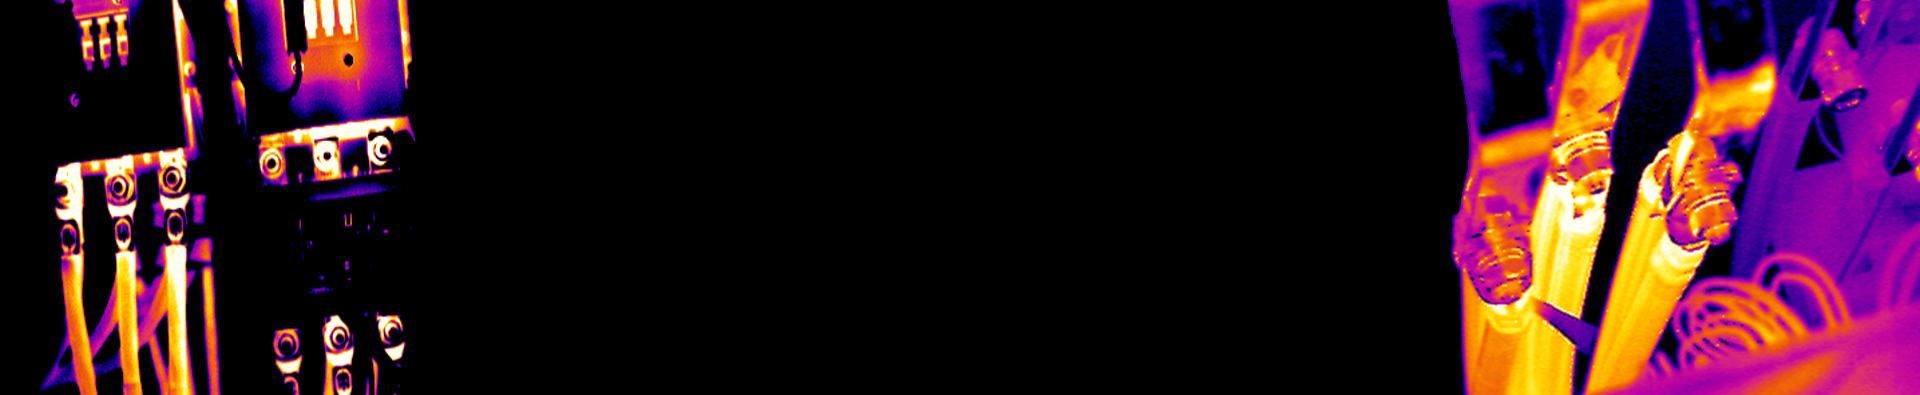 slide-soluciones-termograficas_21